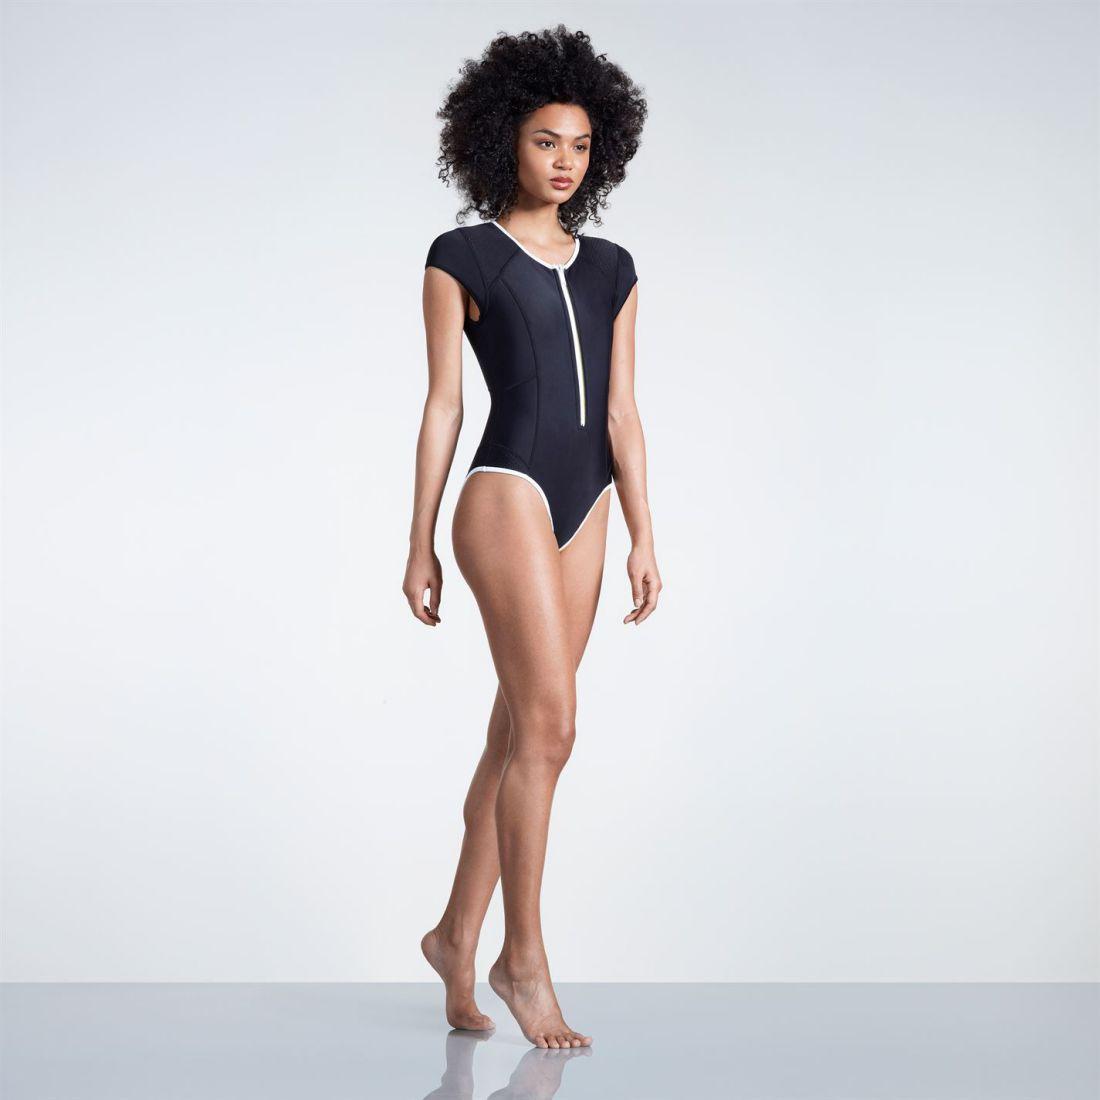 0895f62330035 Image is loading Slazenger-Zip-Short-Sleeve-Swimsuit-Ladies-Swimming-Pool-